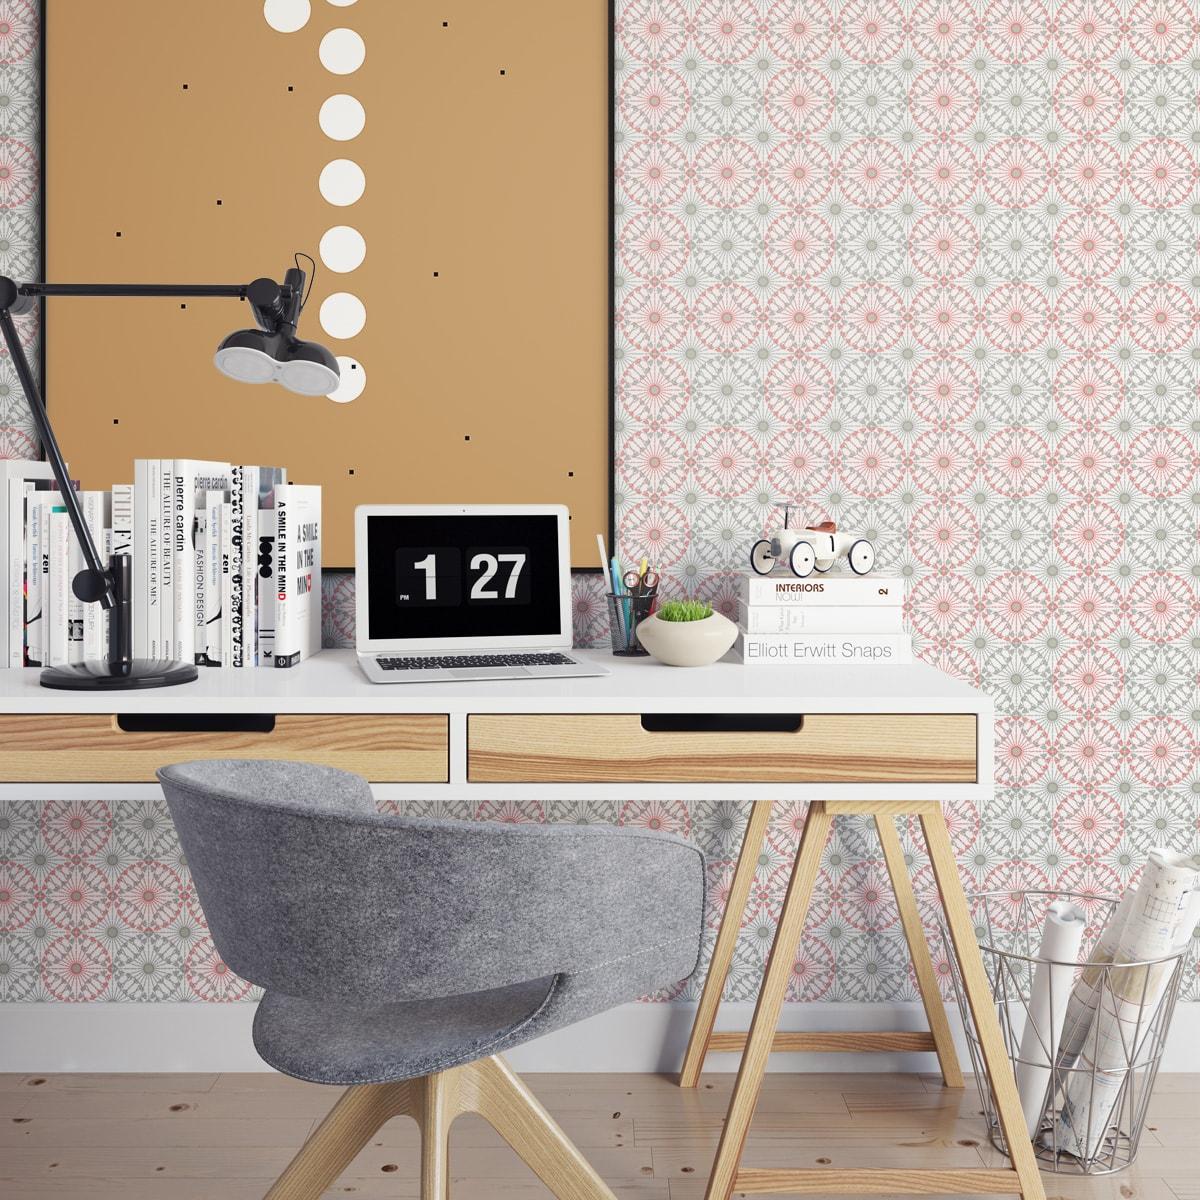 Tapete Wohnzimmer pink: Rosa graue Tapete